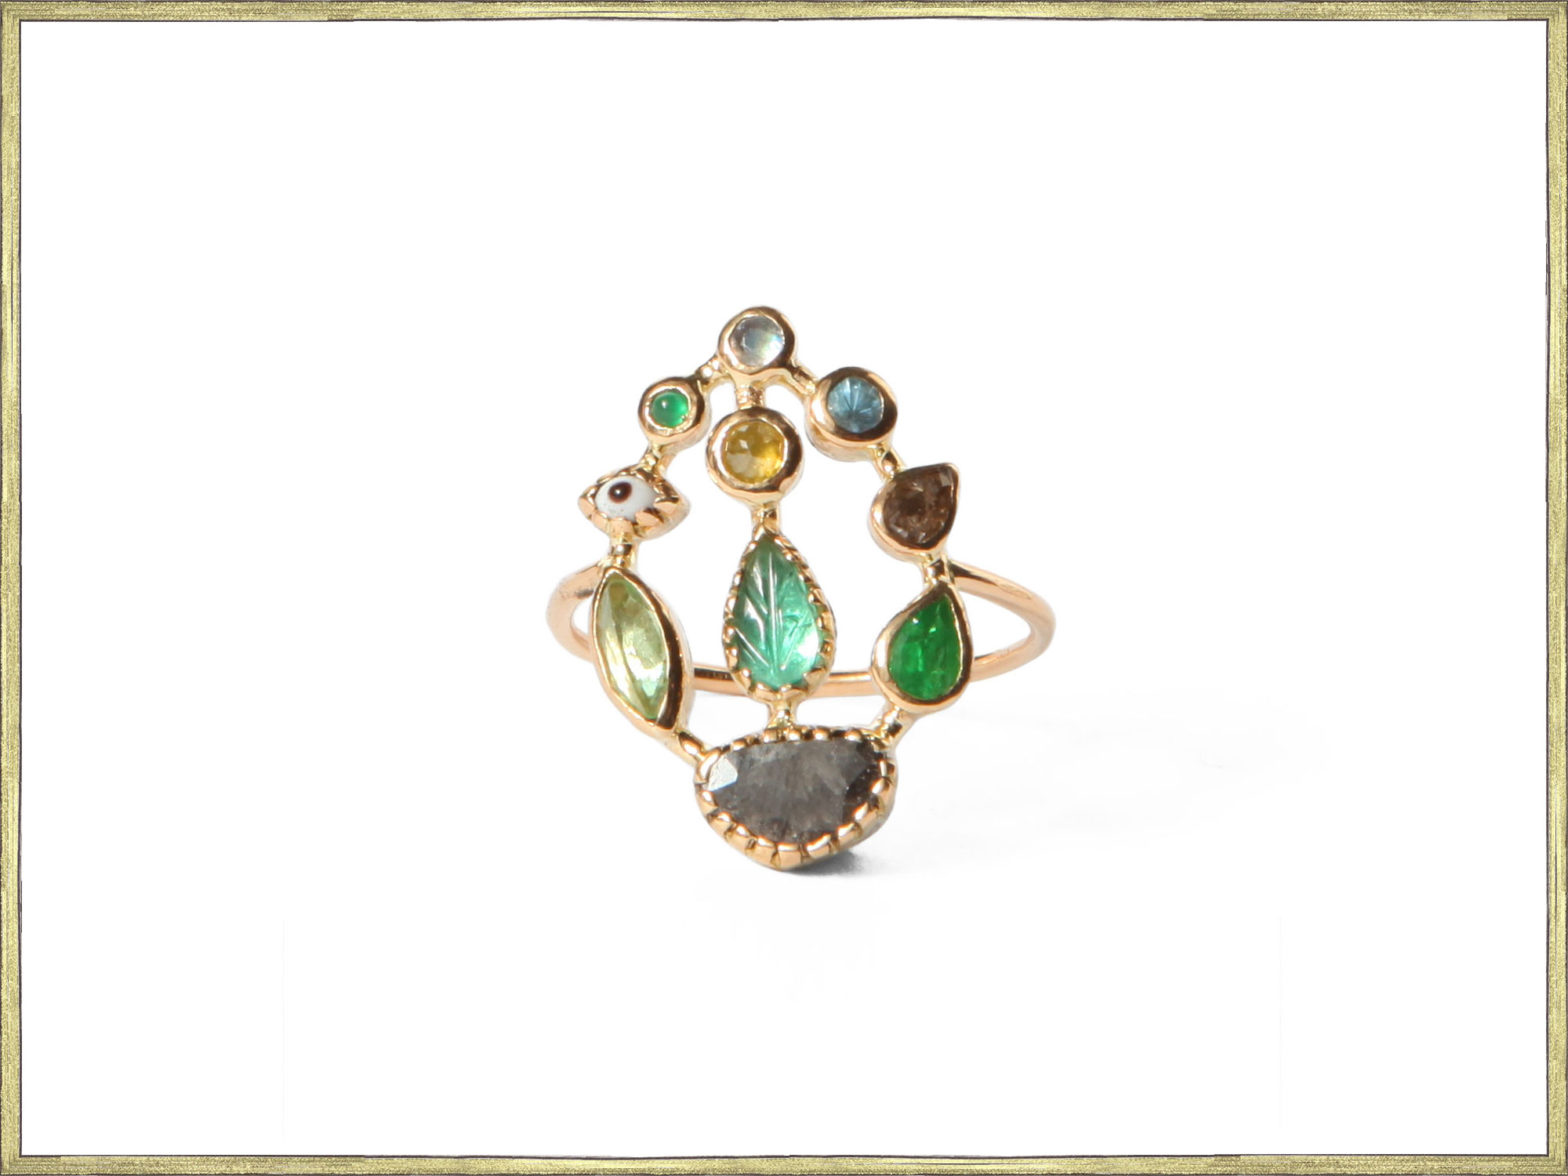 Bague jardin / Garden ring